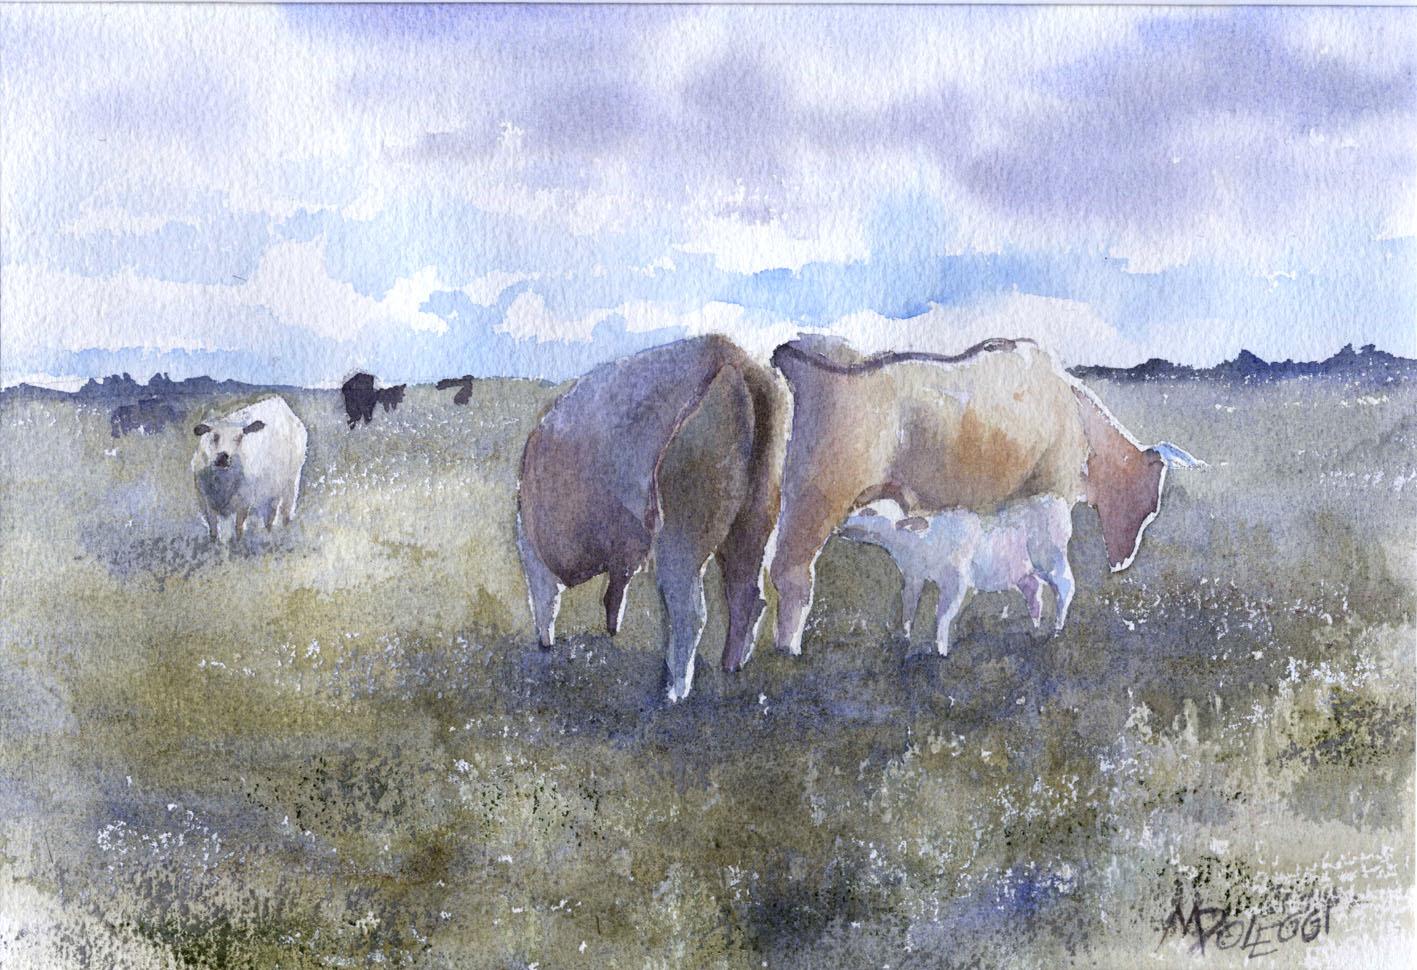 poleggi-mucche-campagna-lussemburghese-m-poleggi